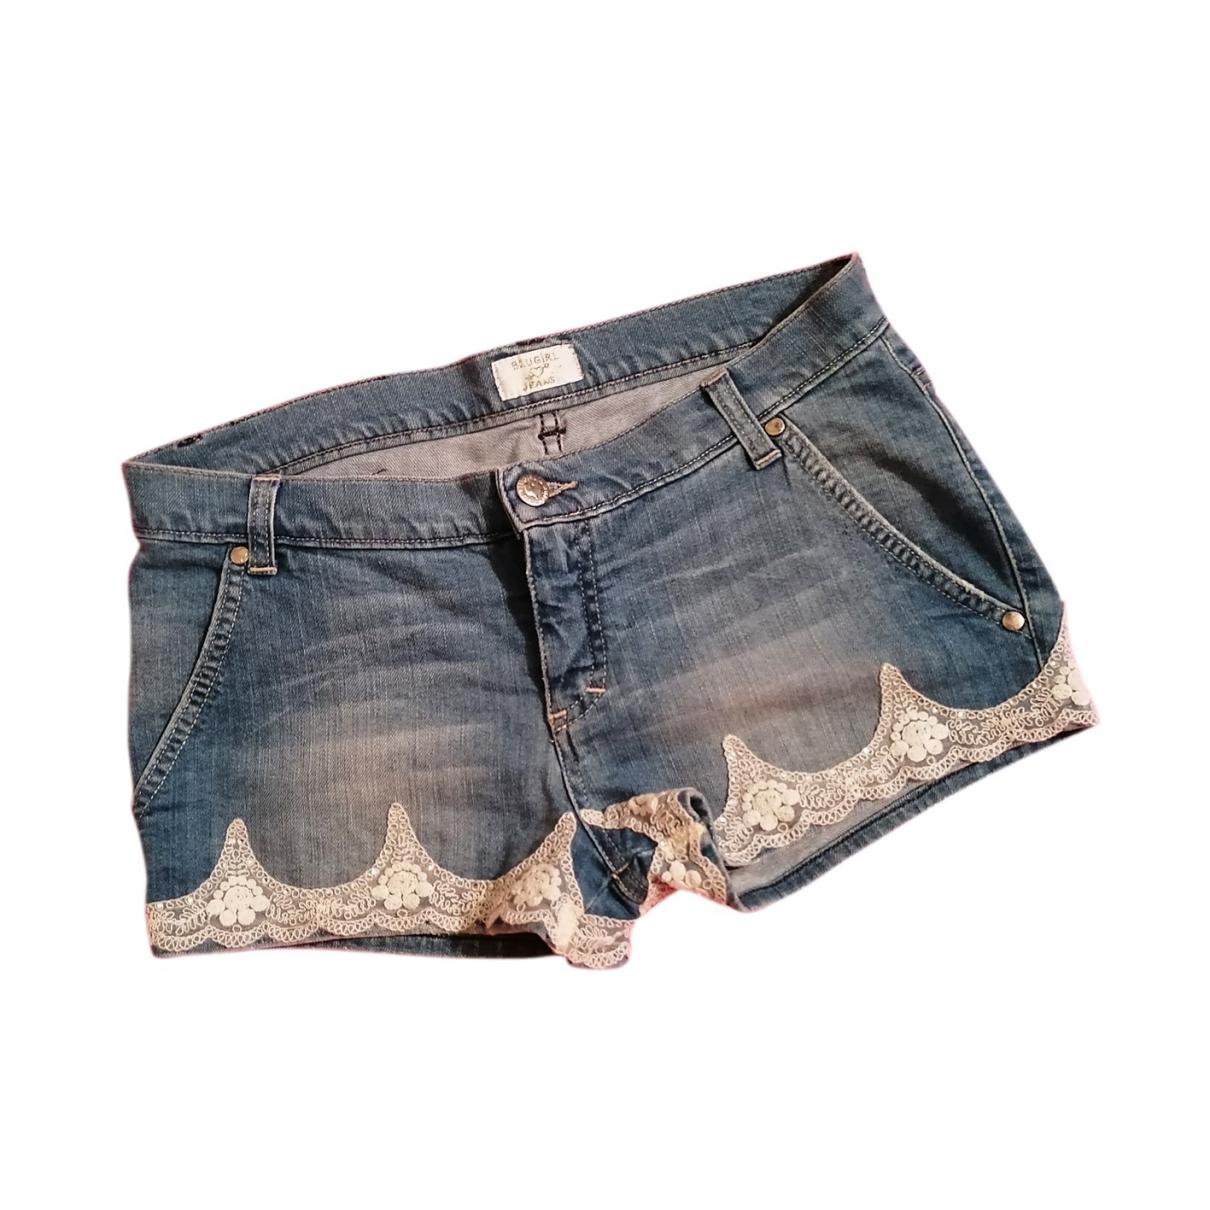 Blumarine \N Navy Denim - Jeans Shorts for Men S International